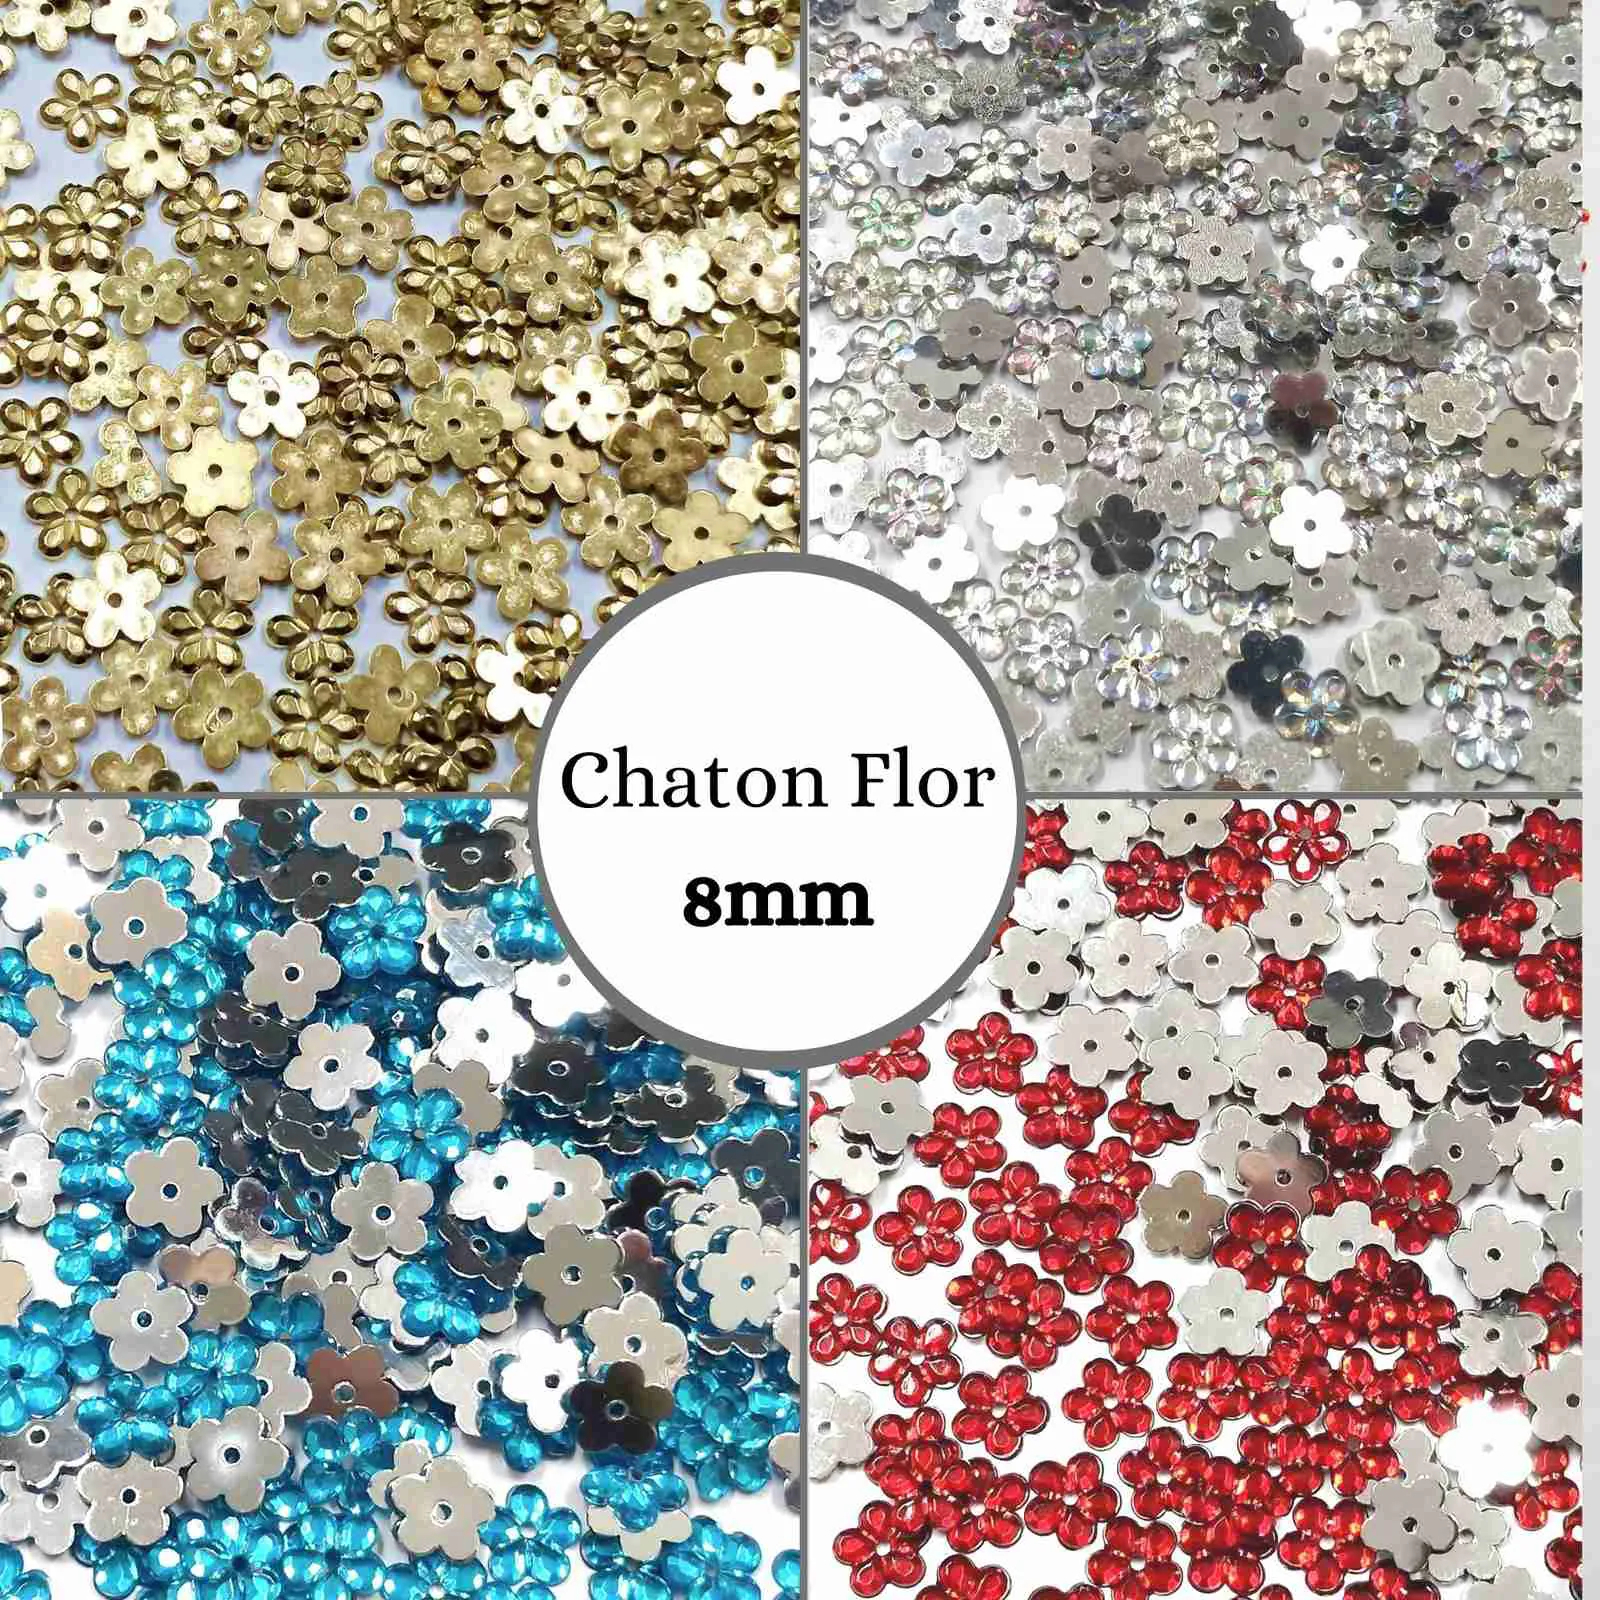 Chaton Flor 08mm - Pacote com 100 unidades